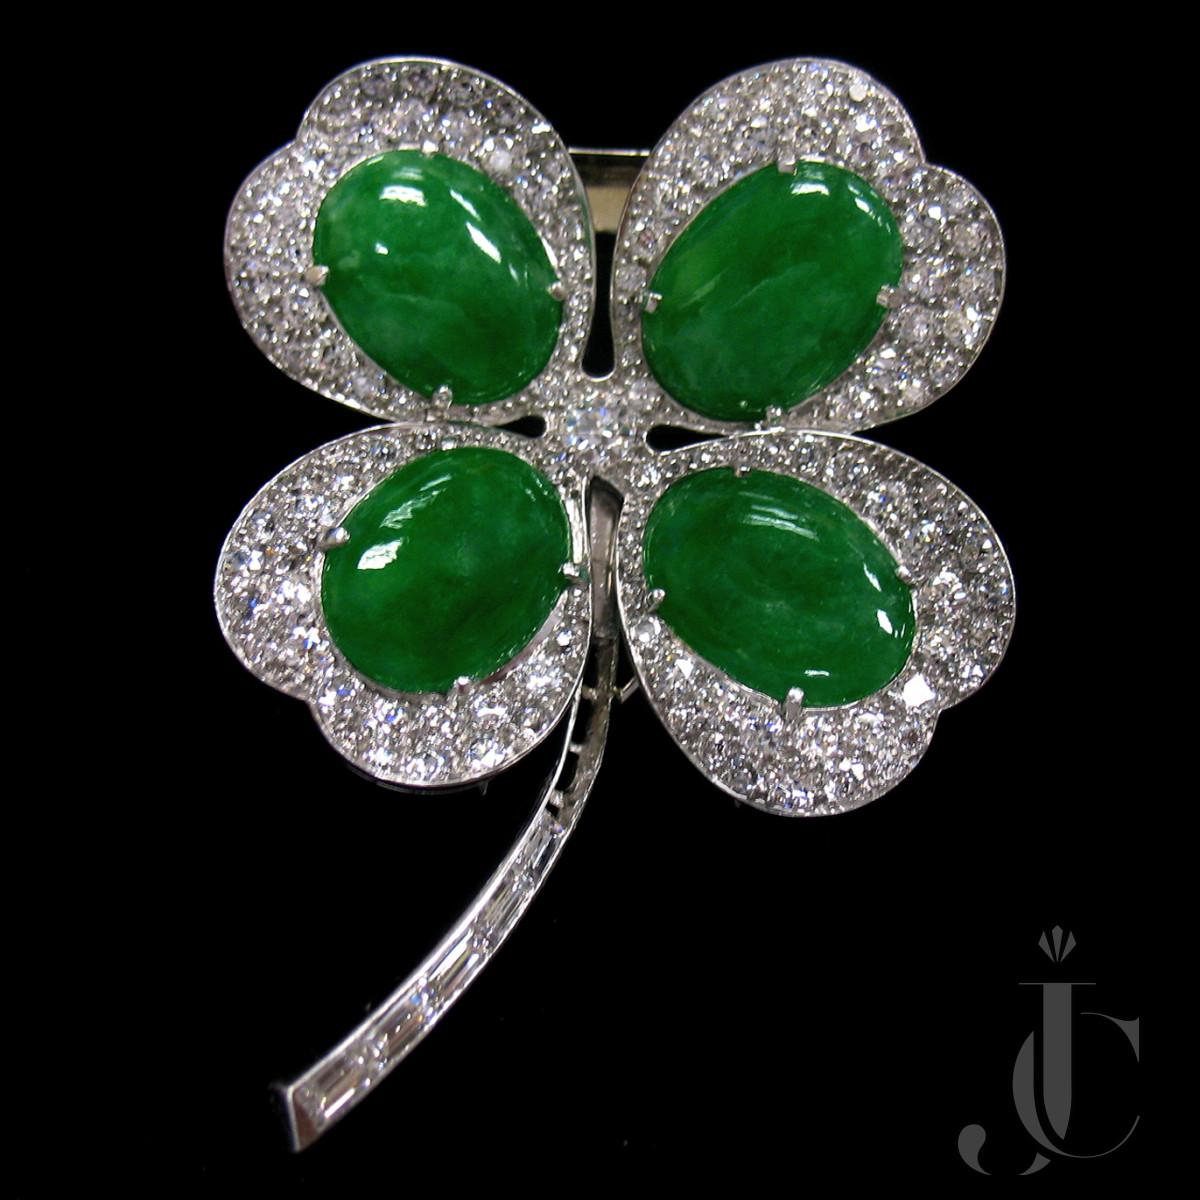 Platinum Jade and Diamonds Clover Brooch/Pendant, circa 1955